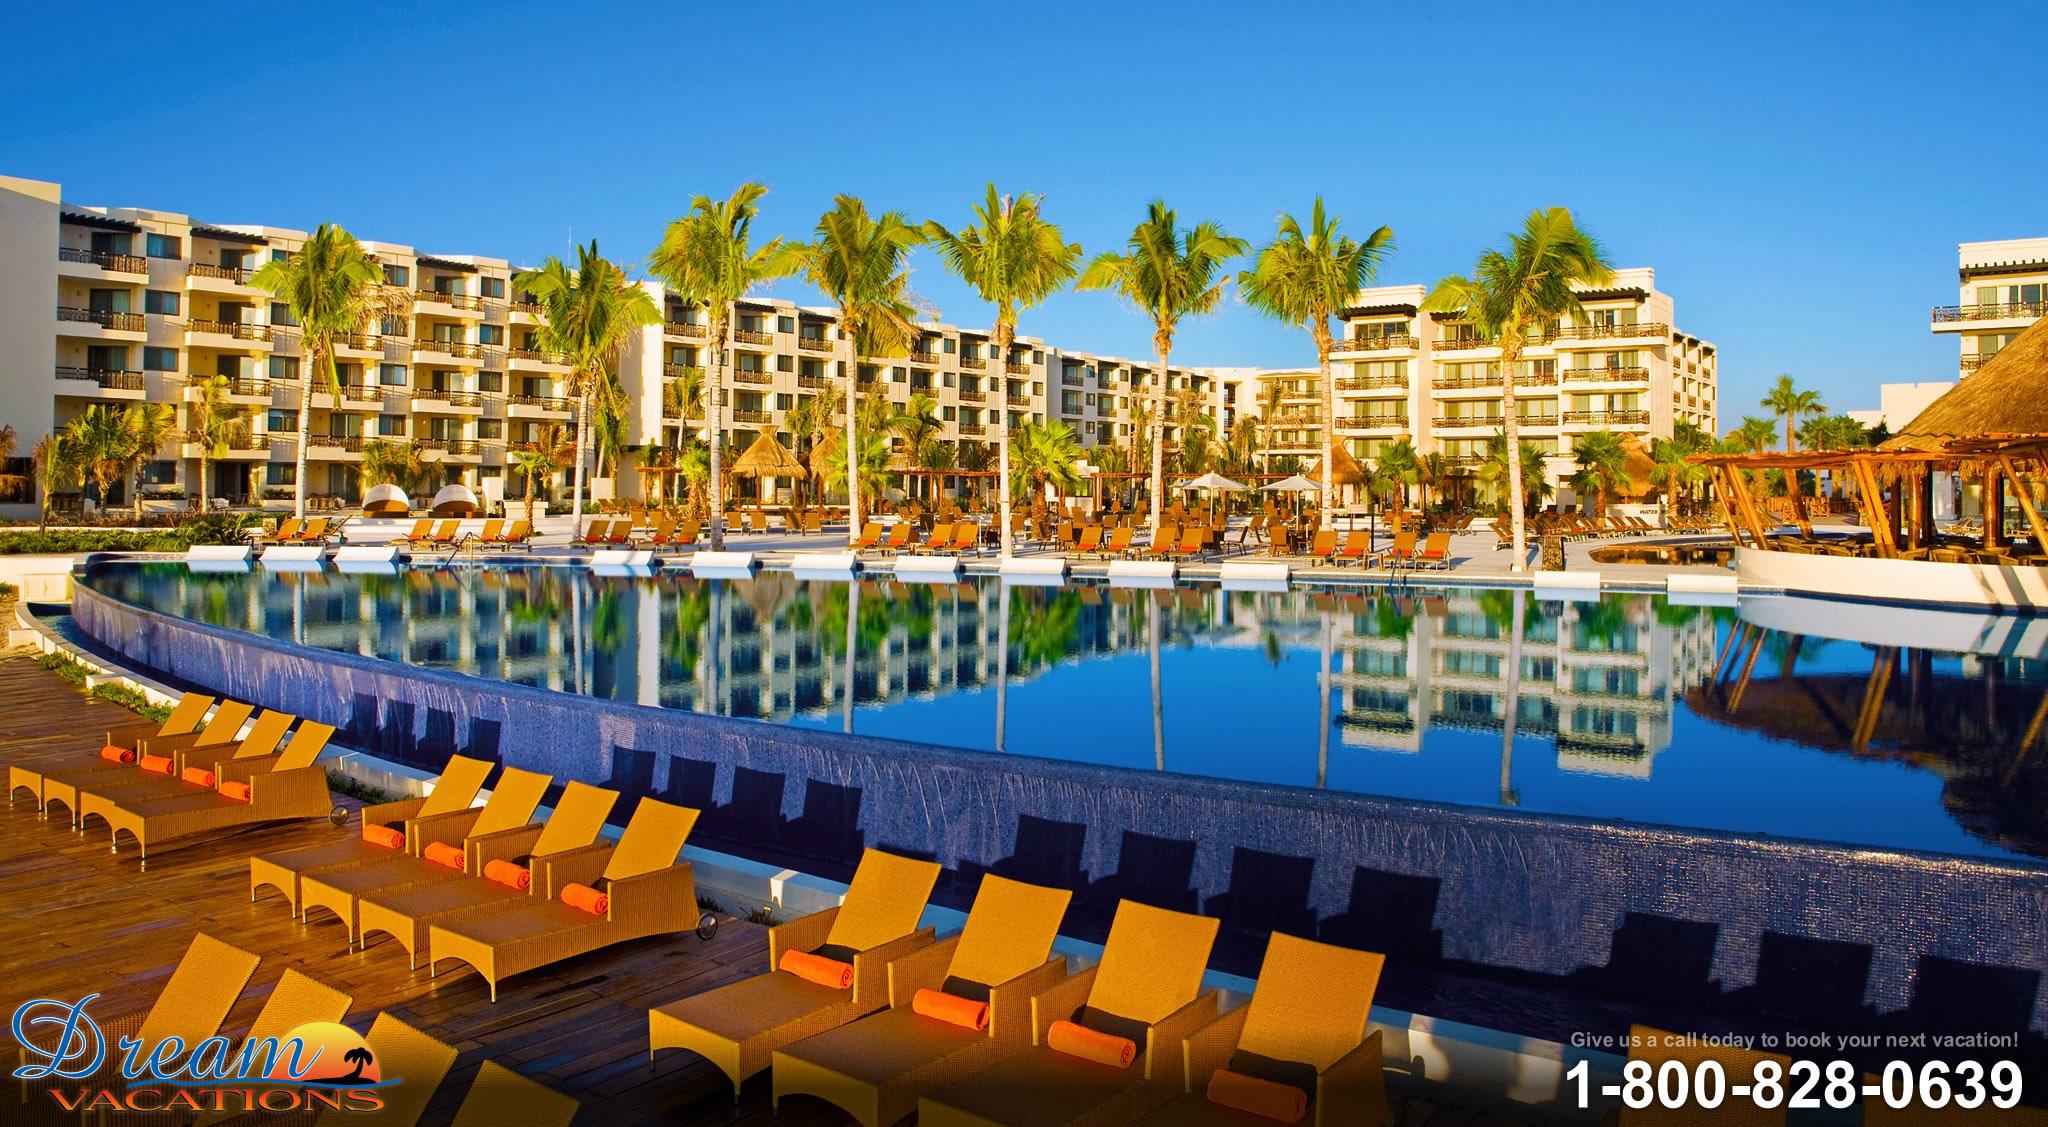 Dreams Riviera Cancun Image Gallery Go Dream Vacations Blog